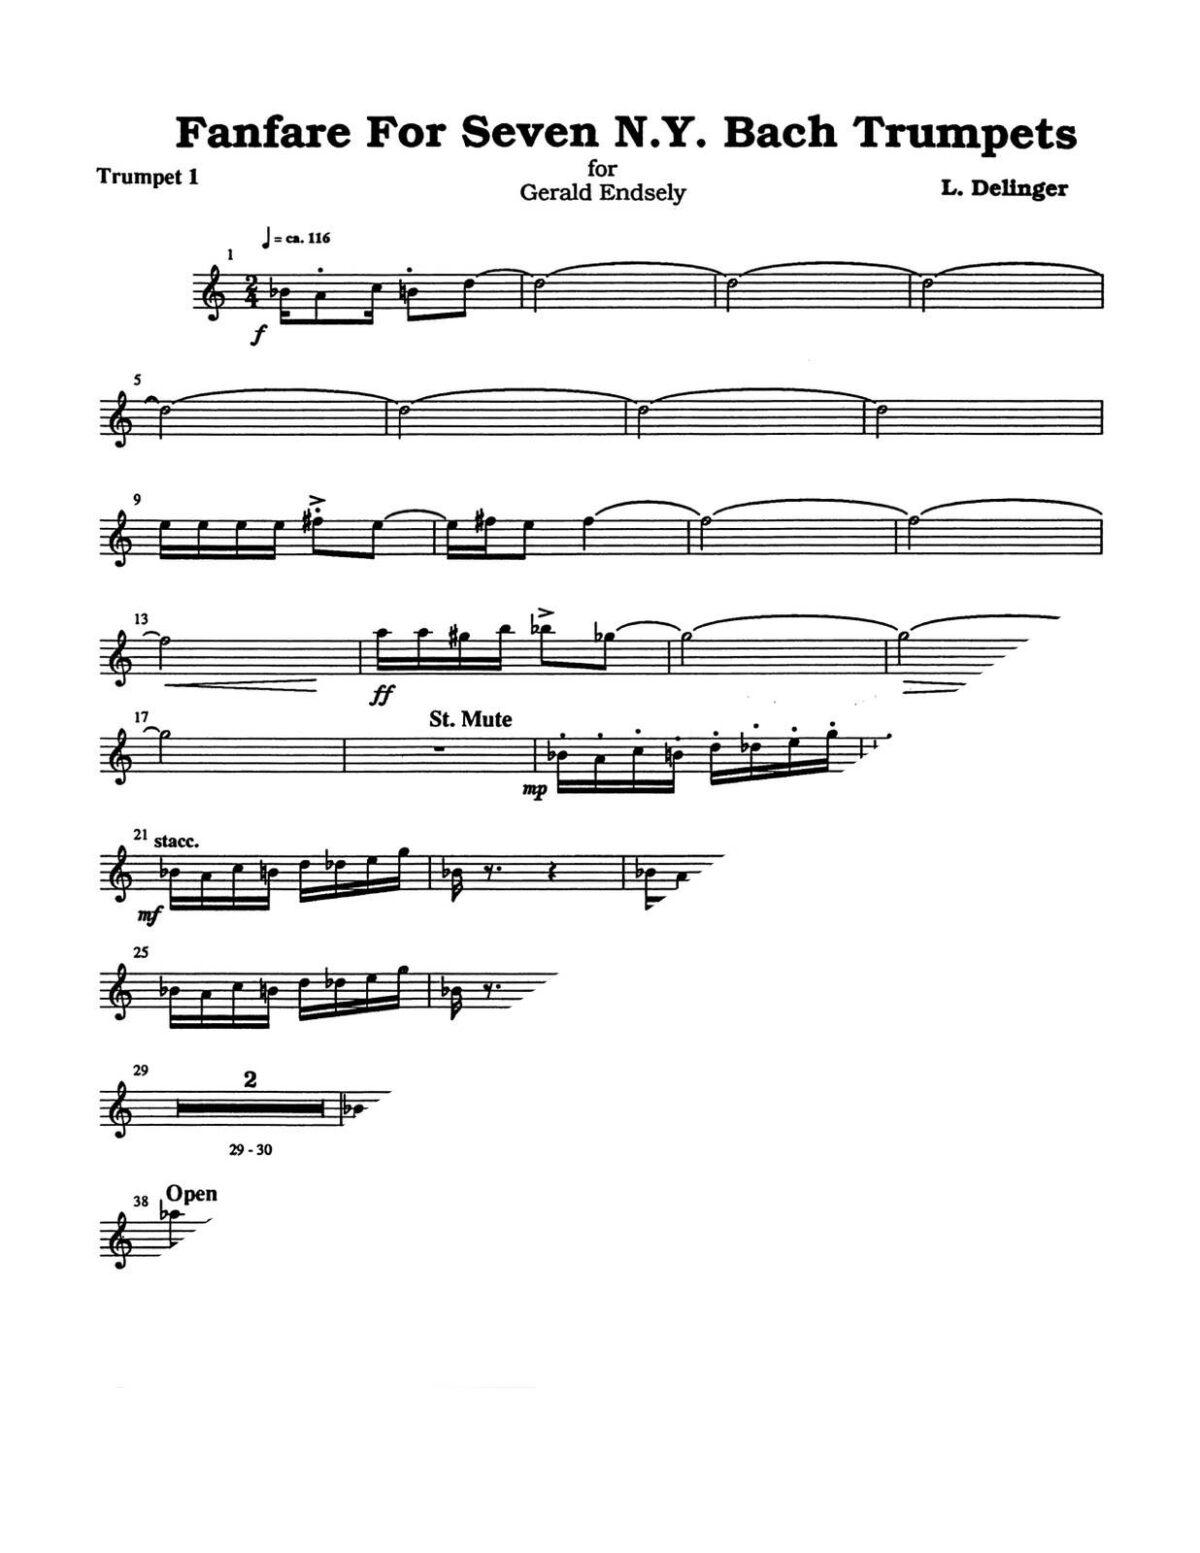 (Chamber) Delinger, Fanfare for Seven N.Y. Bach Trumpets-p03